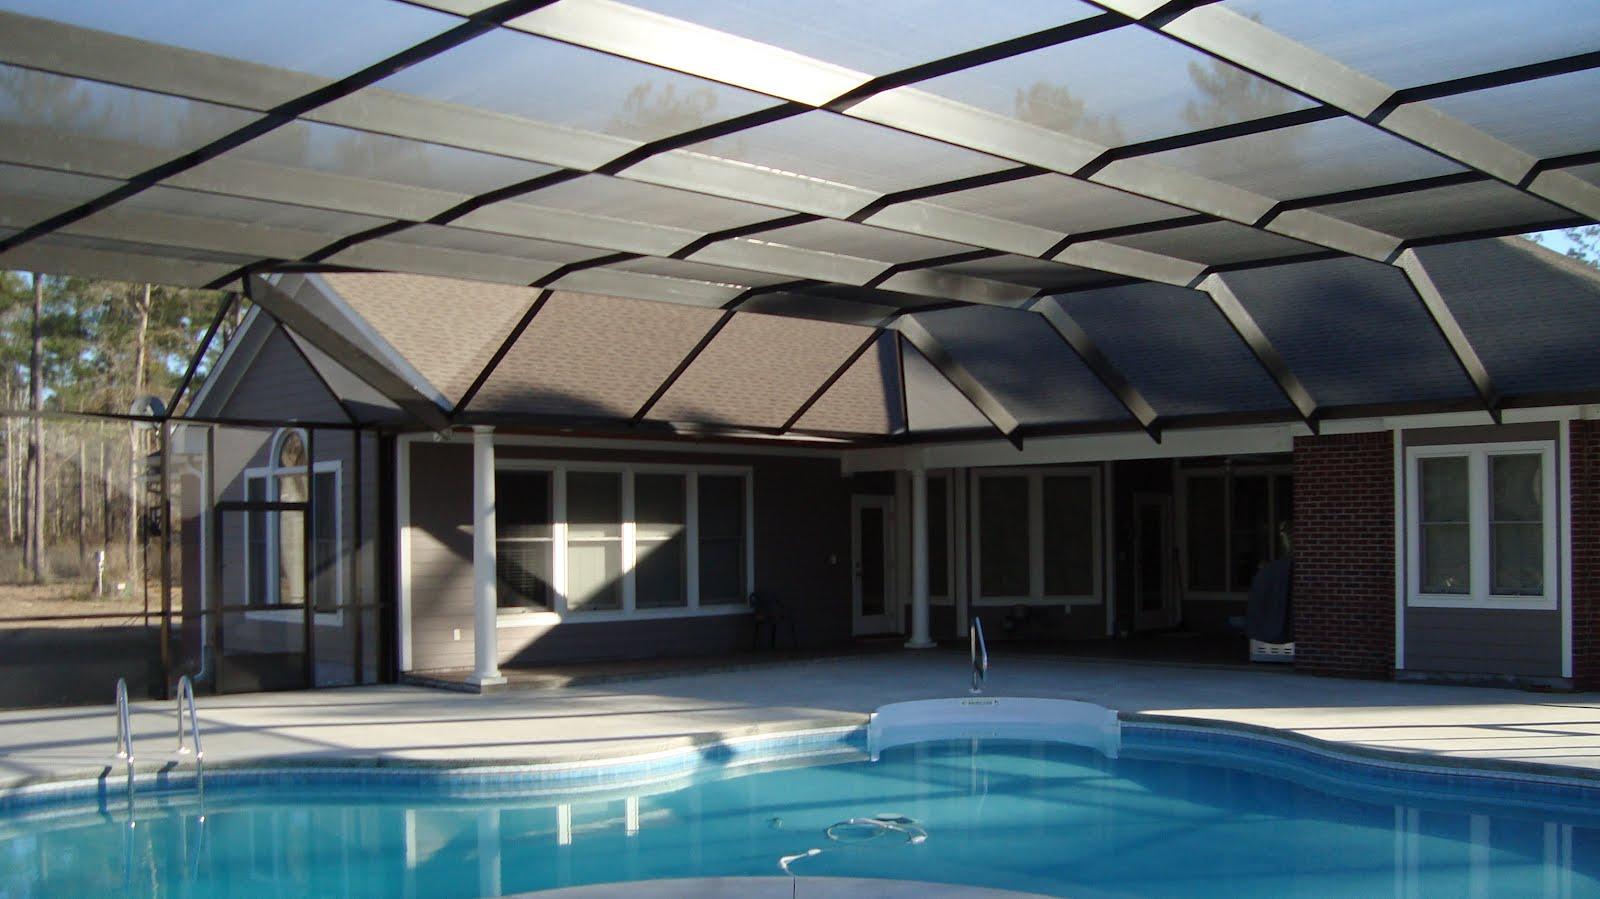 Pool enclosures usa perry florida pool enclosures for Pool enclosures prices